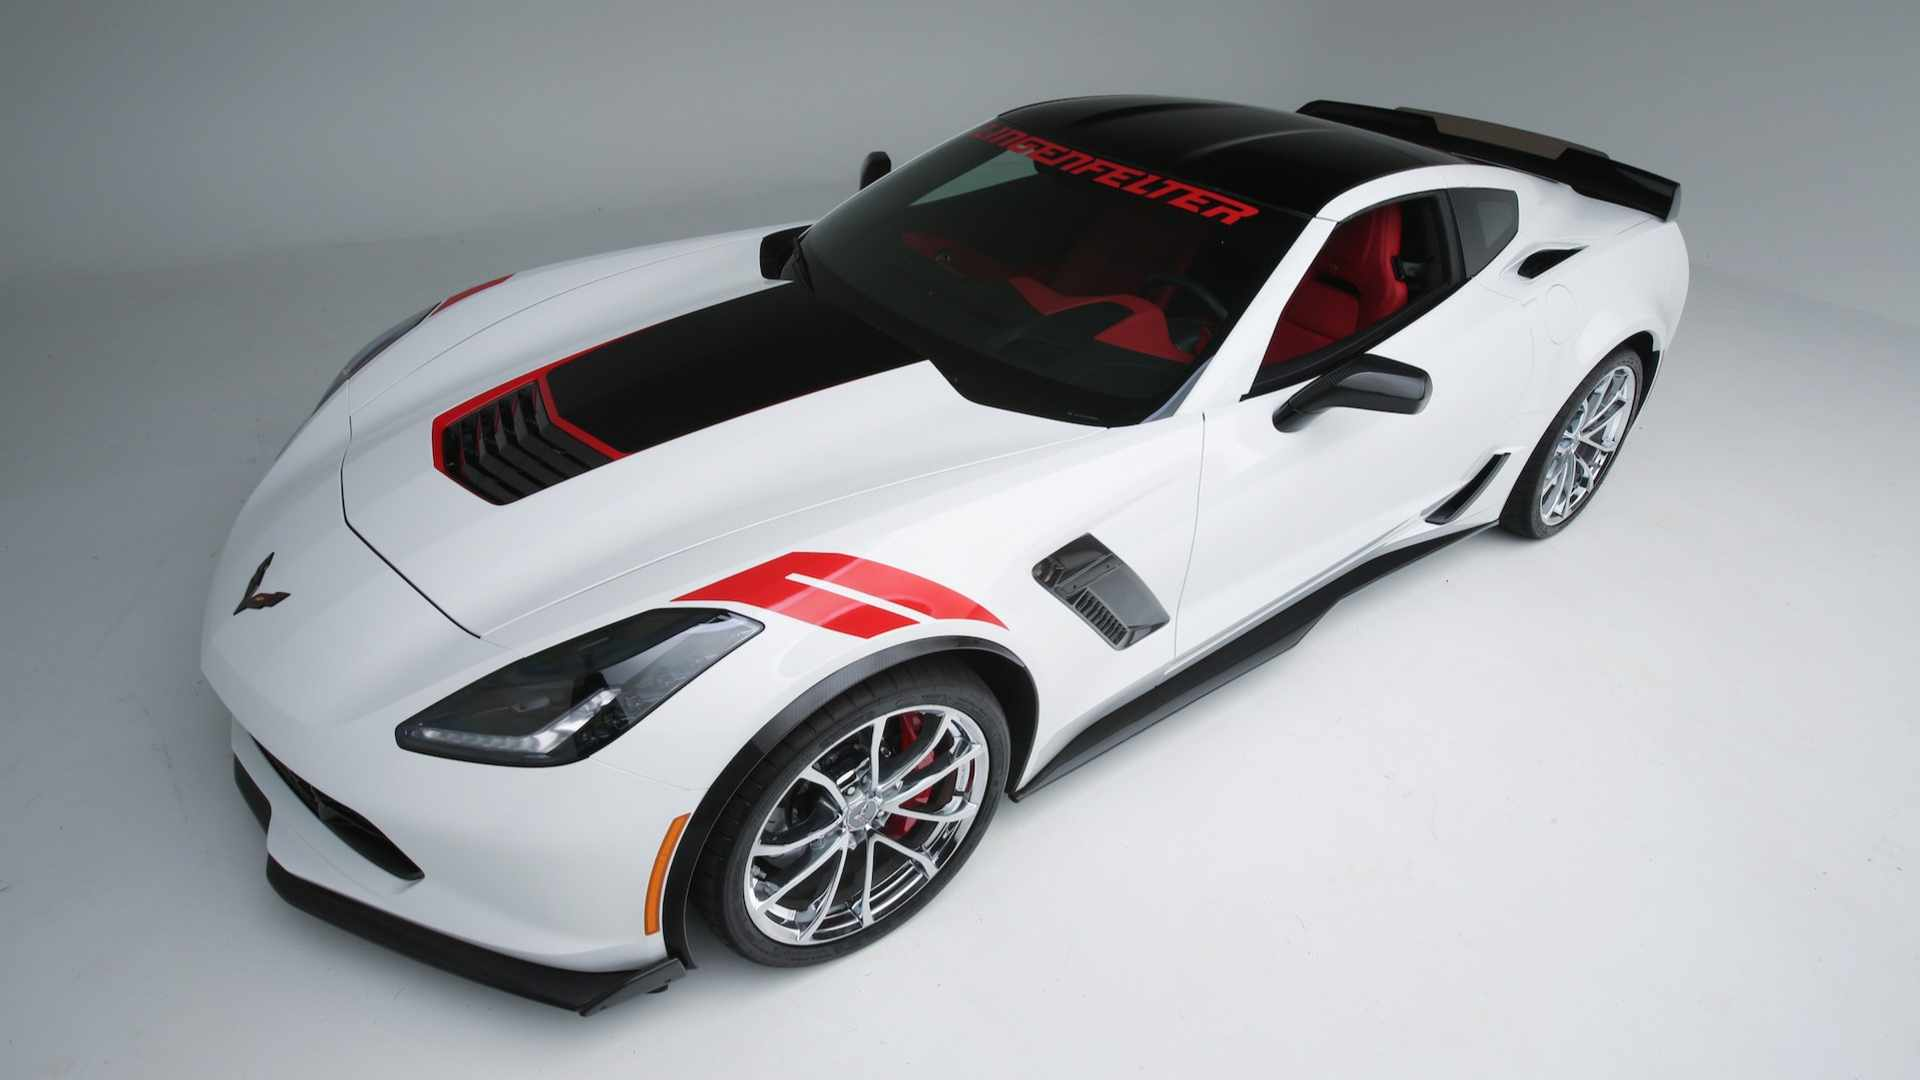 2018 Corvette Dream Giveaway Ends December 31st